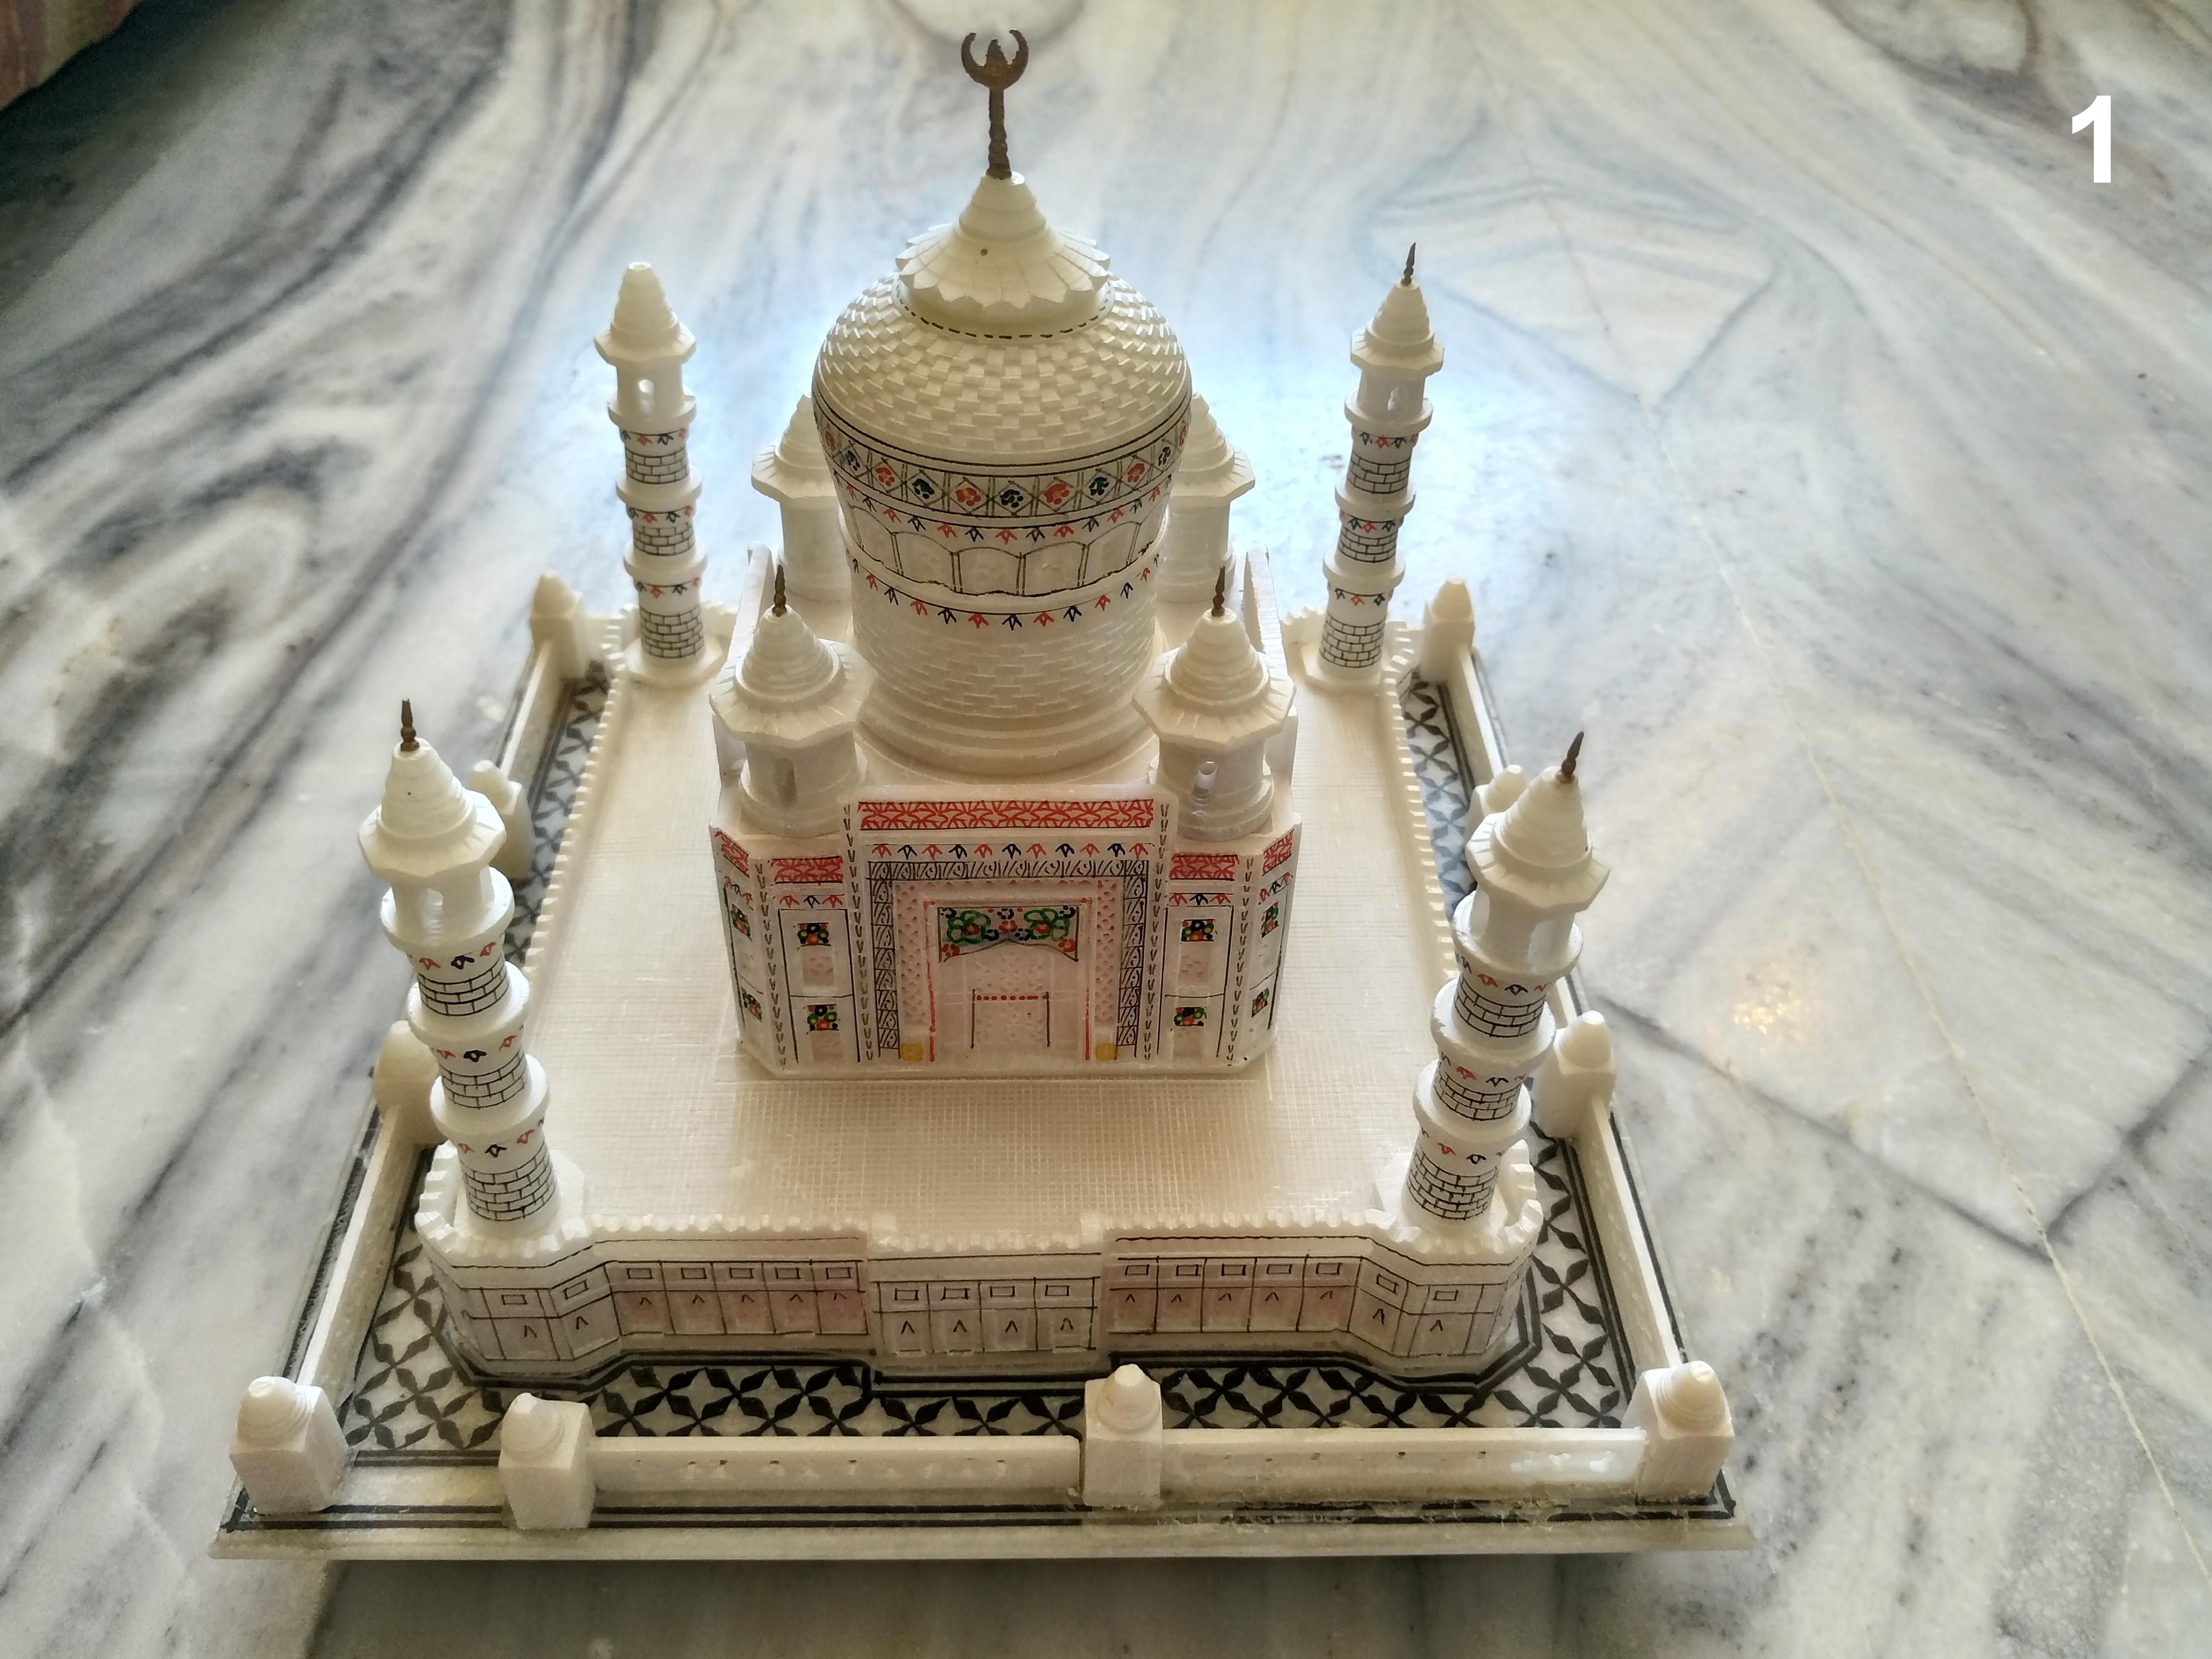 Picture of The Main Replica of Taj Mahal